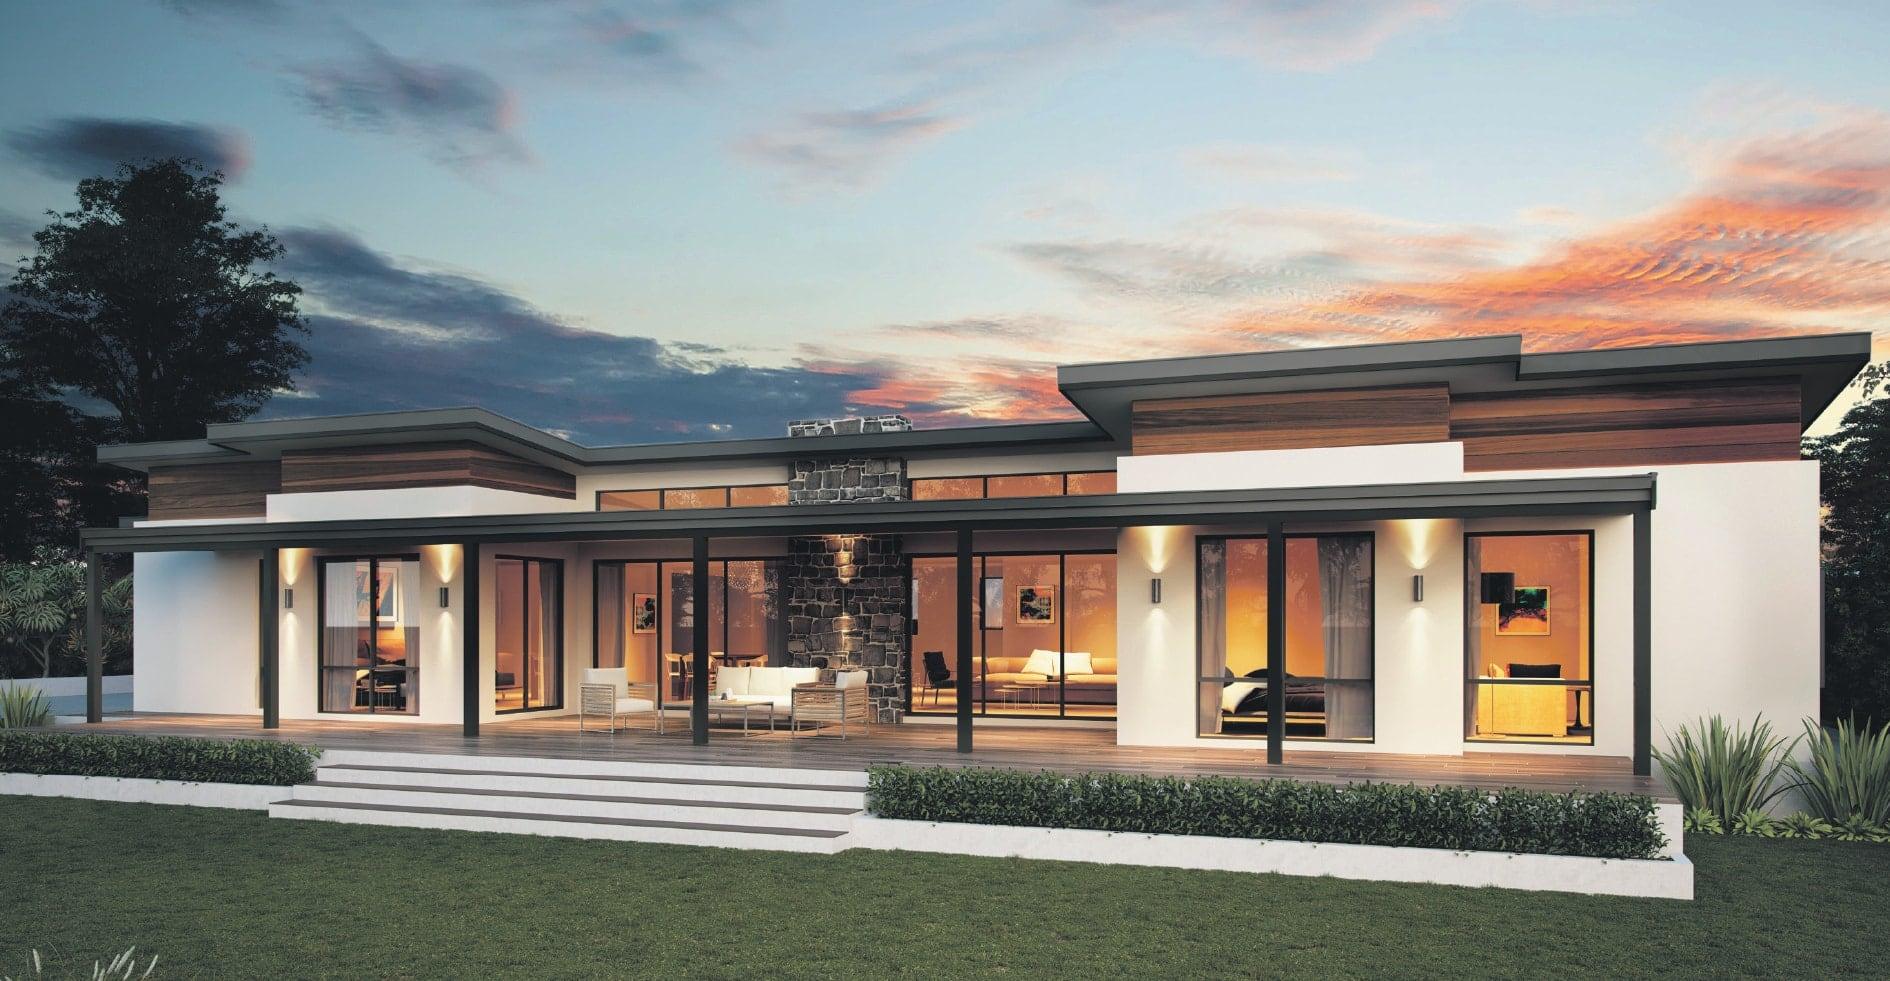 cheap house designs australia Home Design 20+ Cheap House Designs Australia Gif